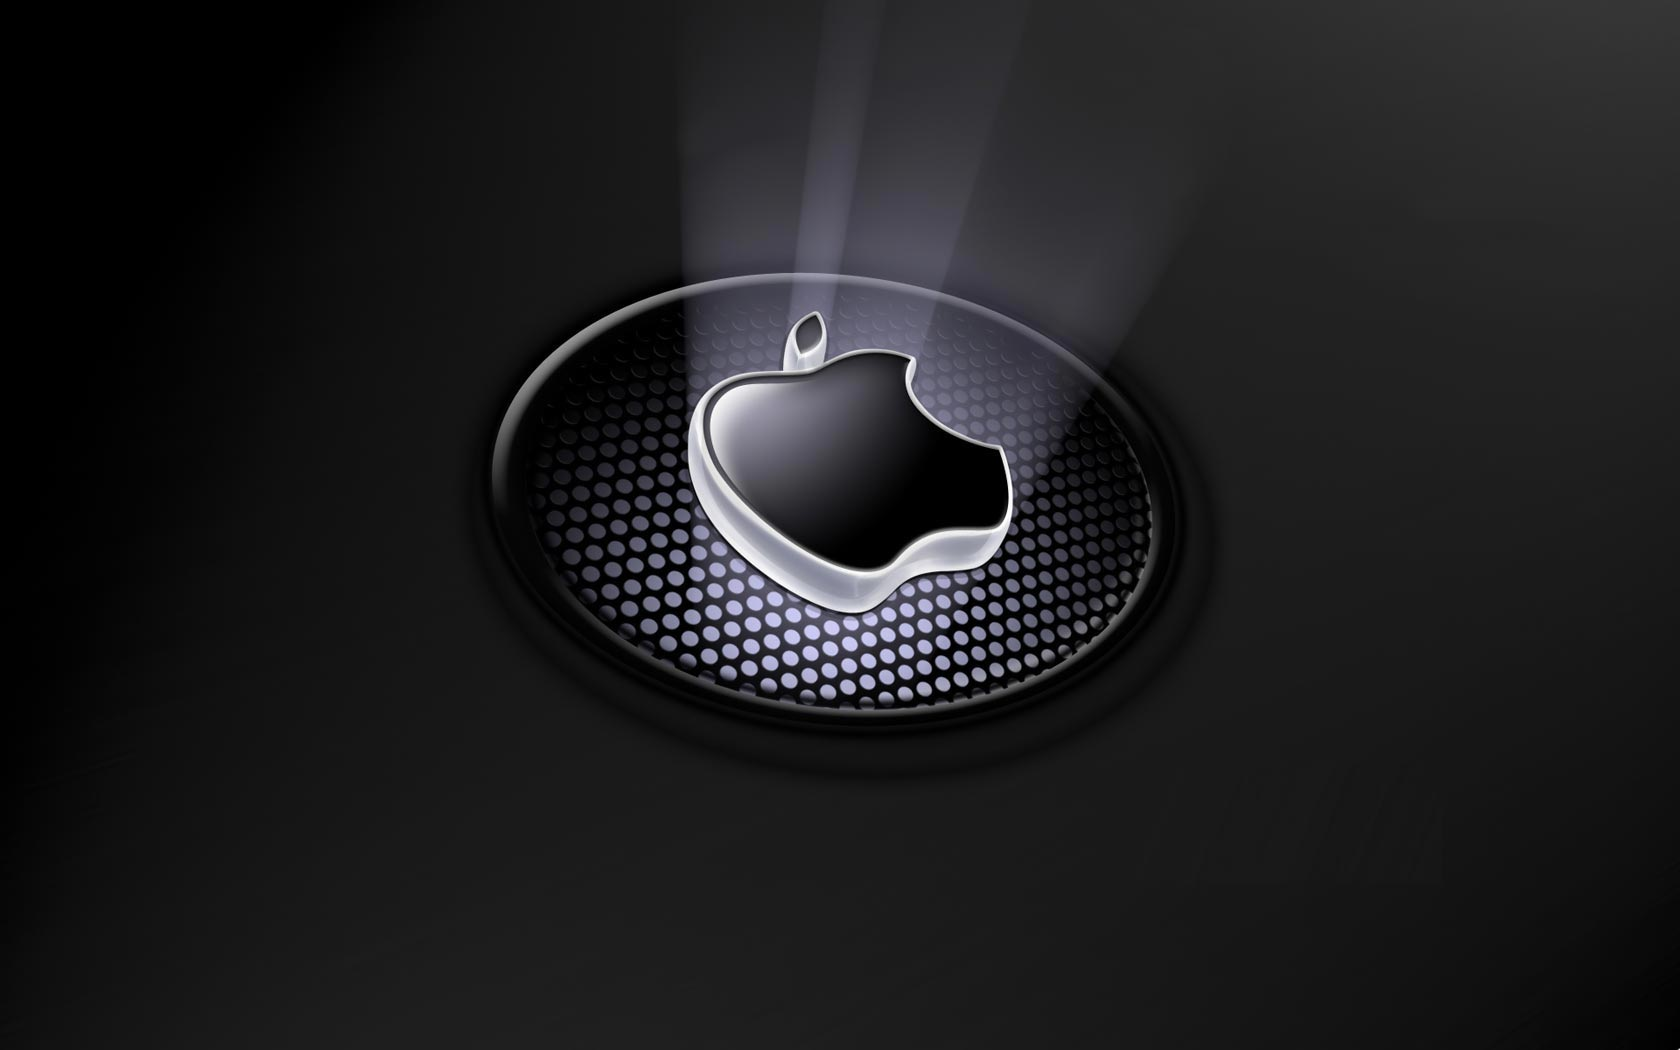 apple logo wallpaper | 1680x1050 | #84574